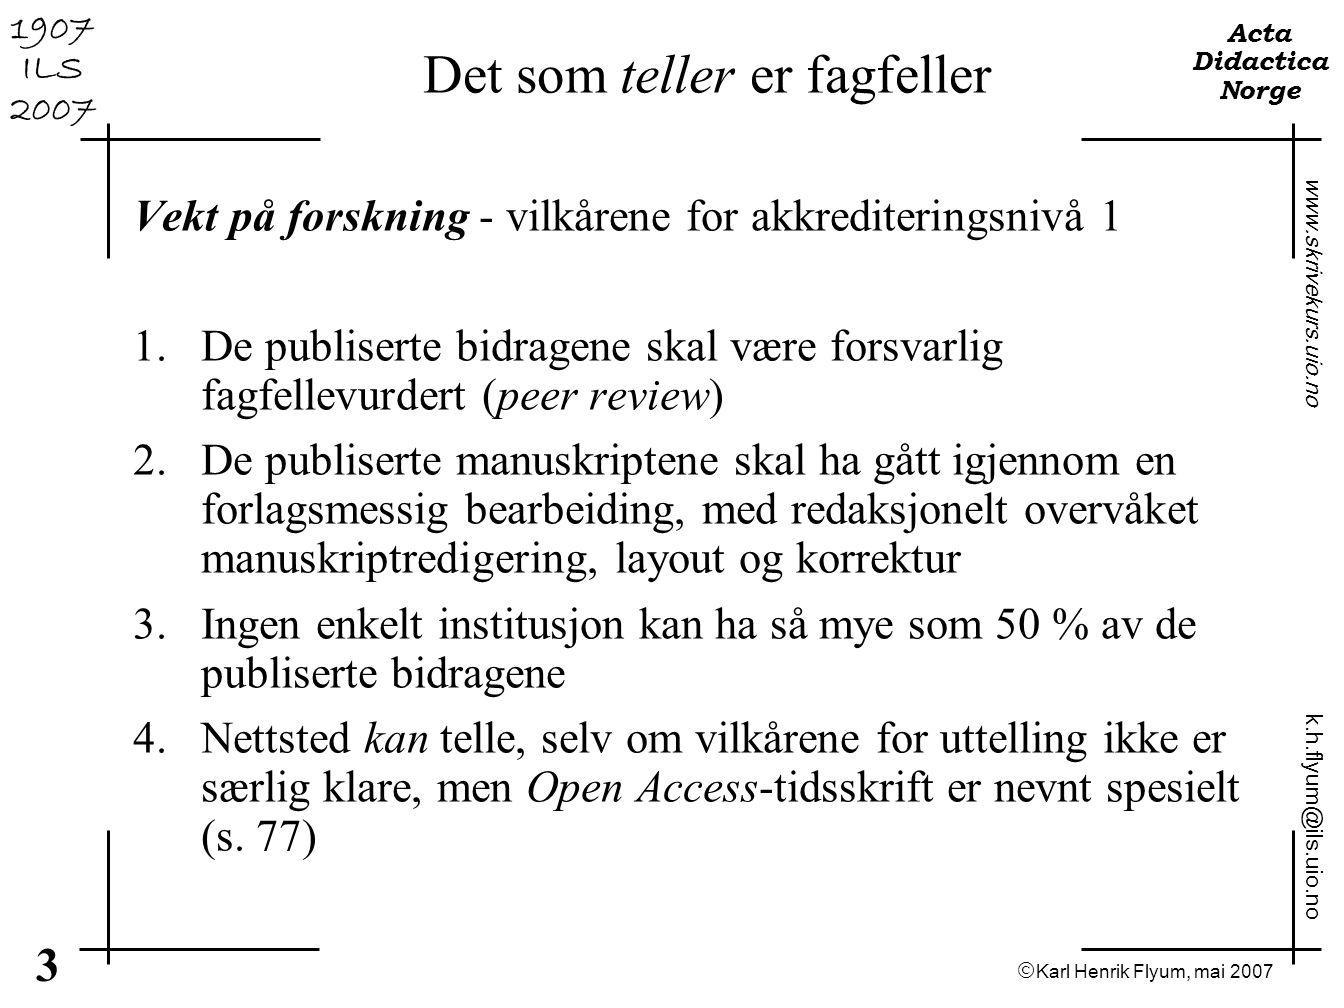  Karl Henrik Flyum, mai 2007 4 www.skrivekurs.uio.no k.h.flyum@ils.uio.no Acta Didactica Norge 1907 ILS 2007 Acta Didactica Norge - prosjektet 2007 2006 Acta Didactica Norge - prosjektet ble satt i gang ved ILS 6/9.